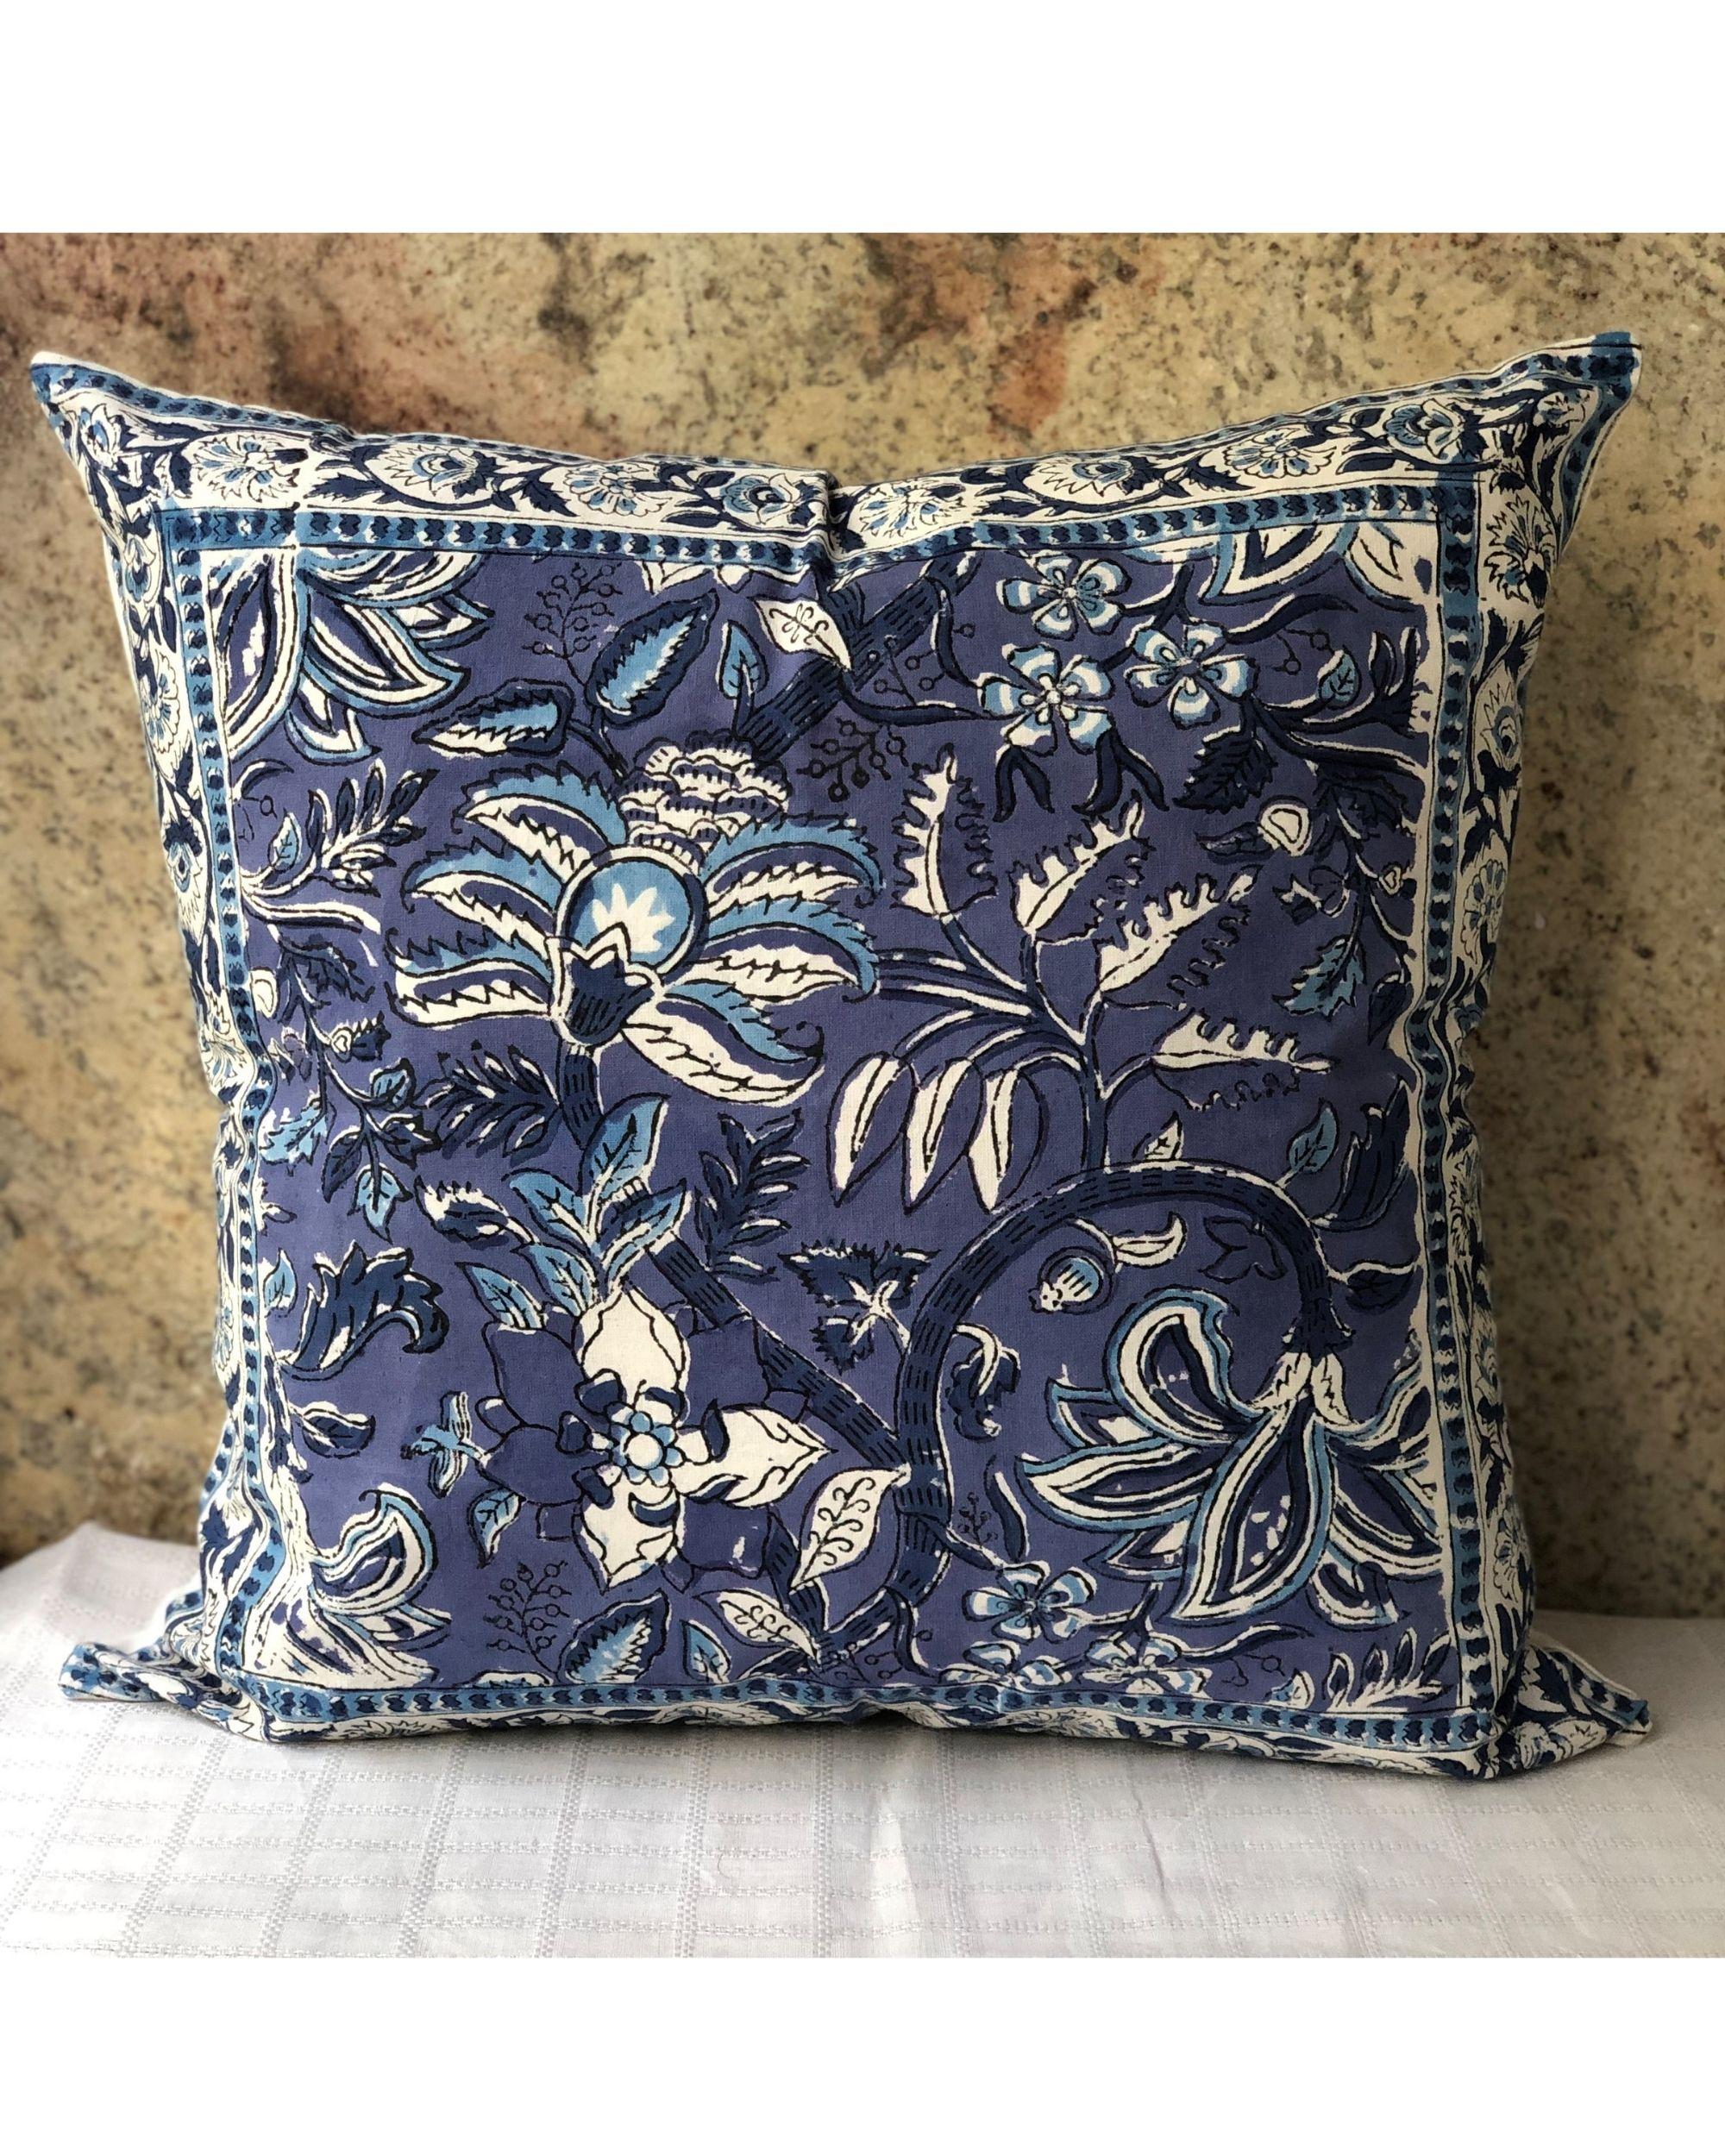 Indigo floral handblock printed cushion cover - set of two